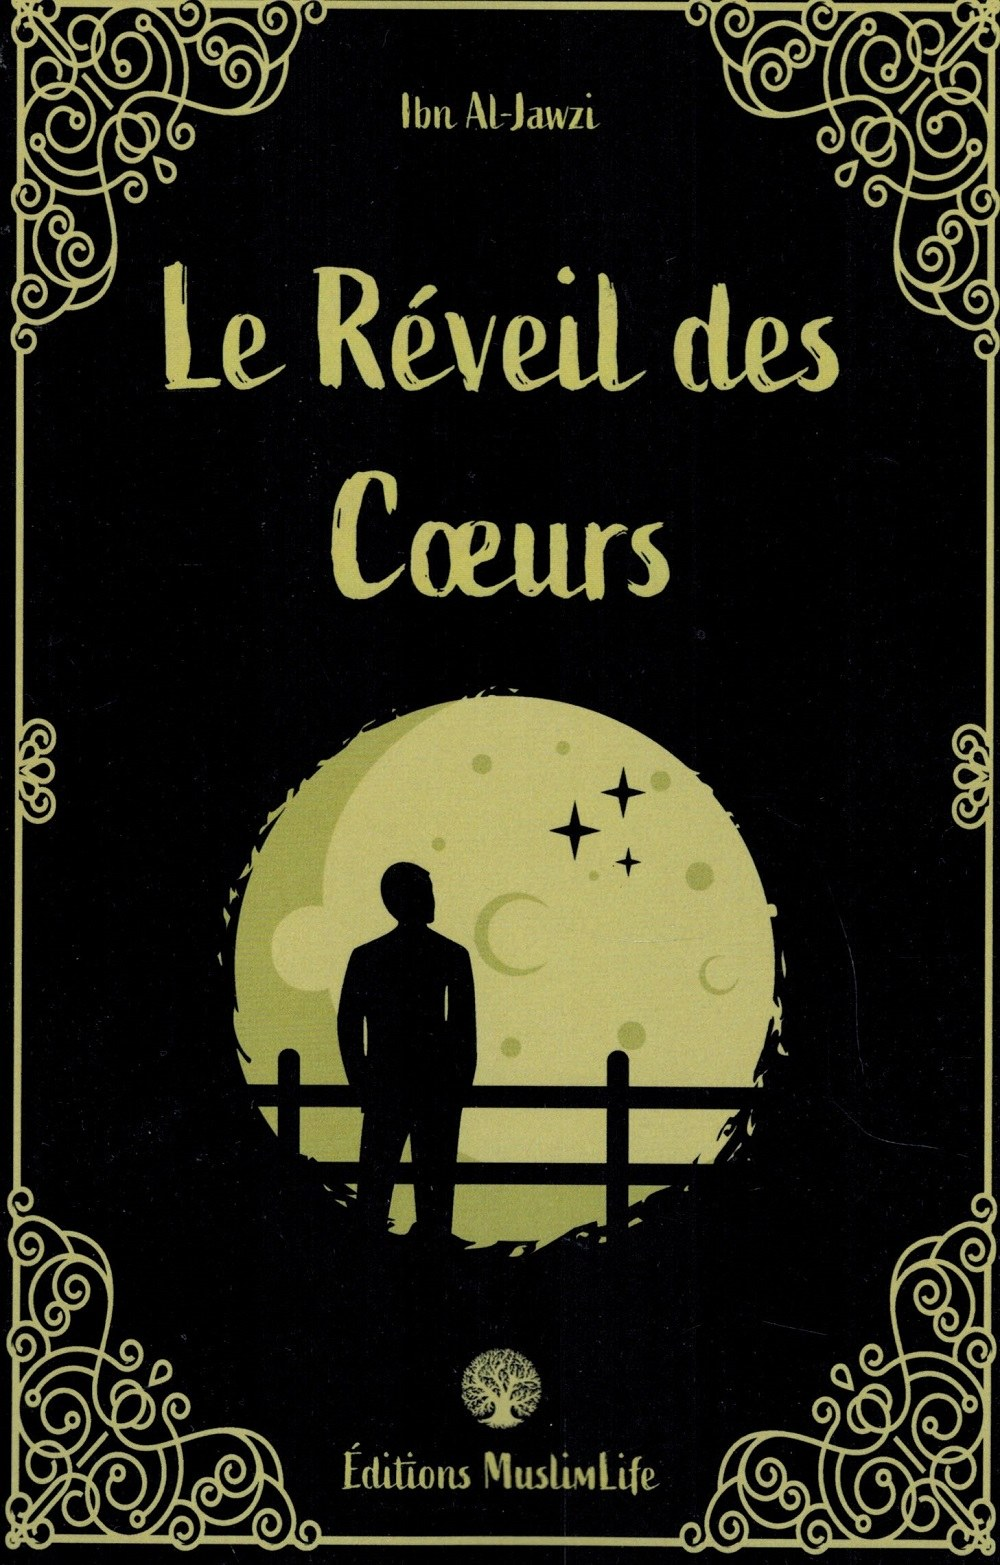 5e6133f995277_reveil-des-coeurs-ibn-al-jawzi